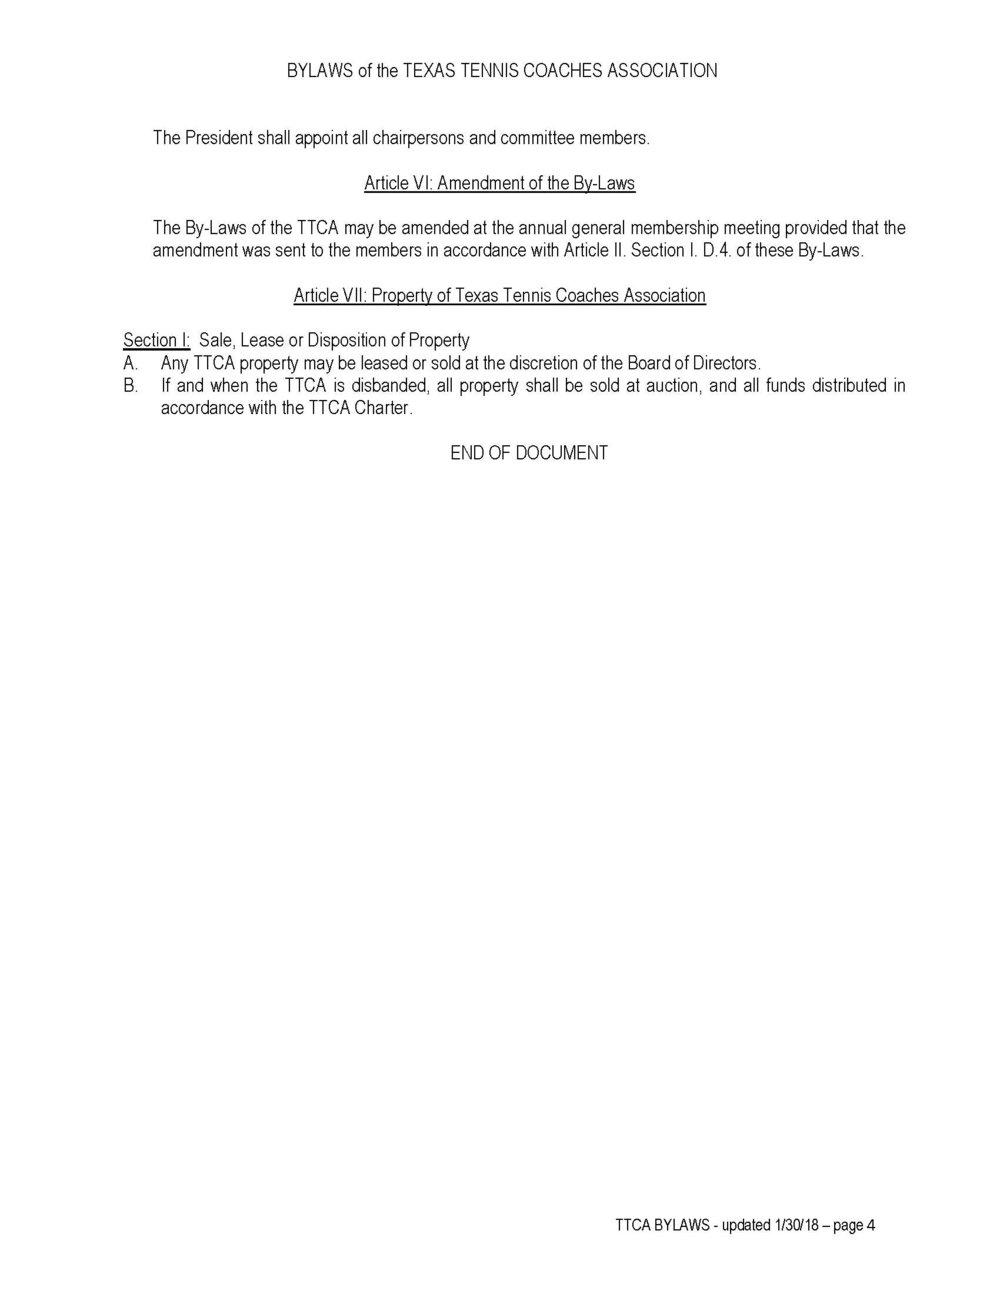 TTCA Bylaws_Page_4.jpg